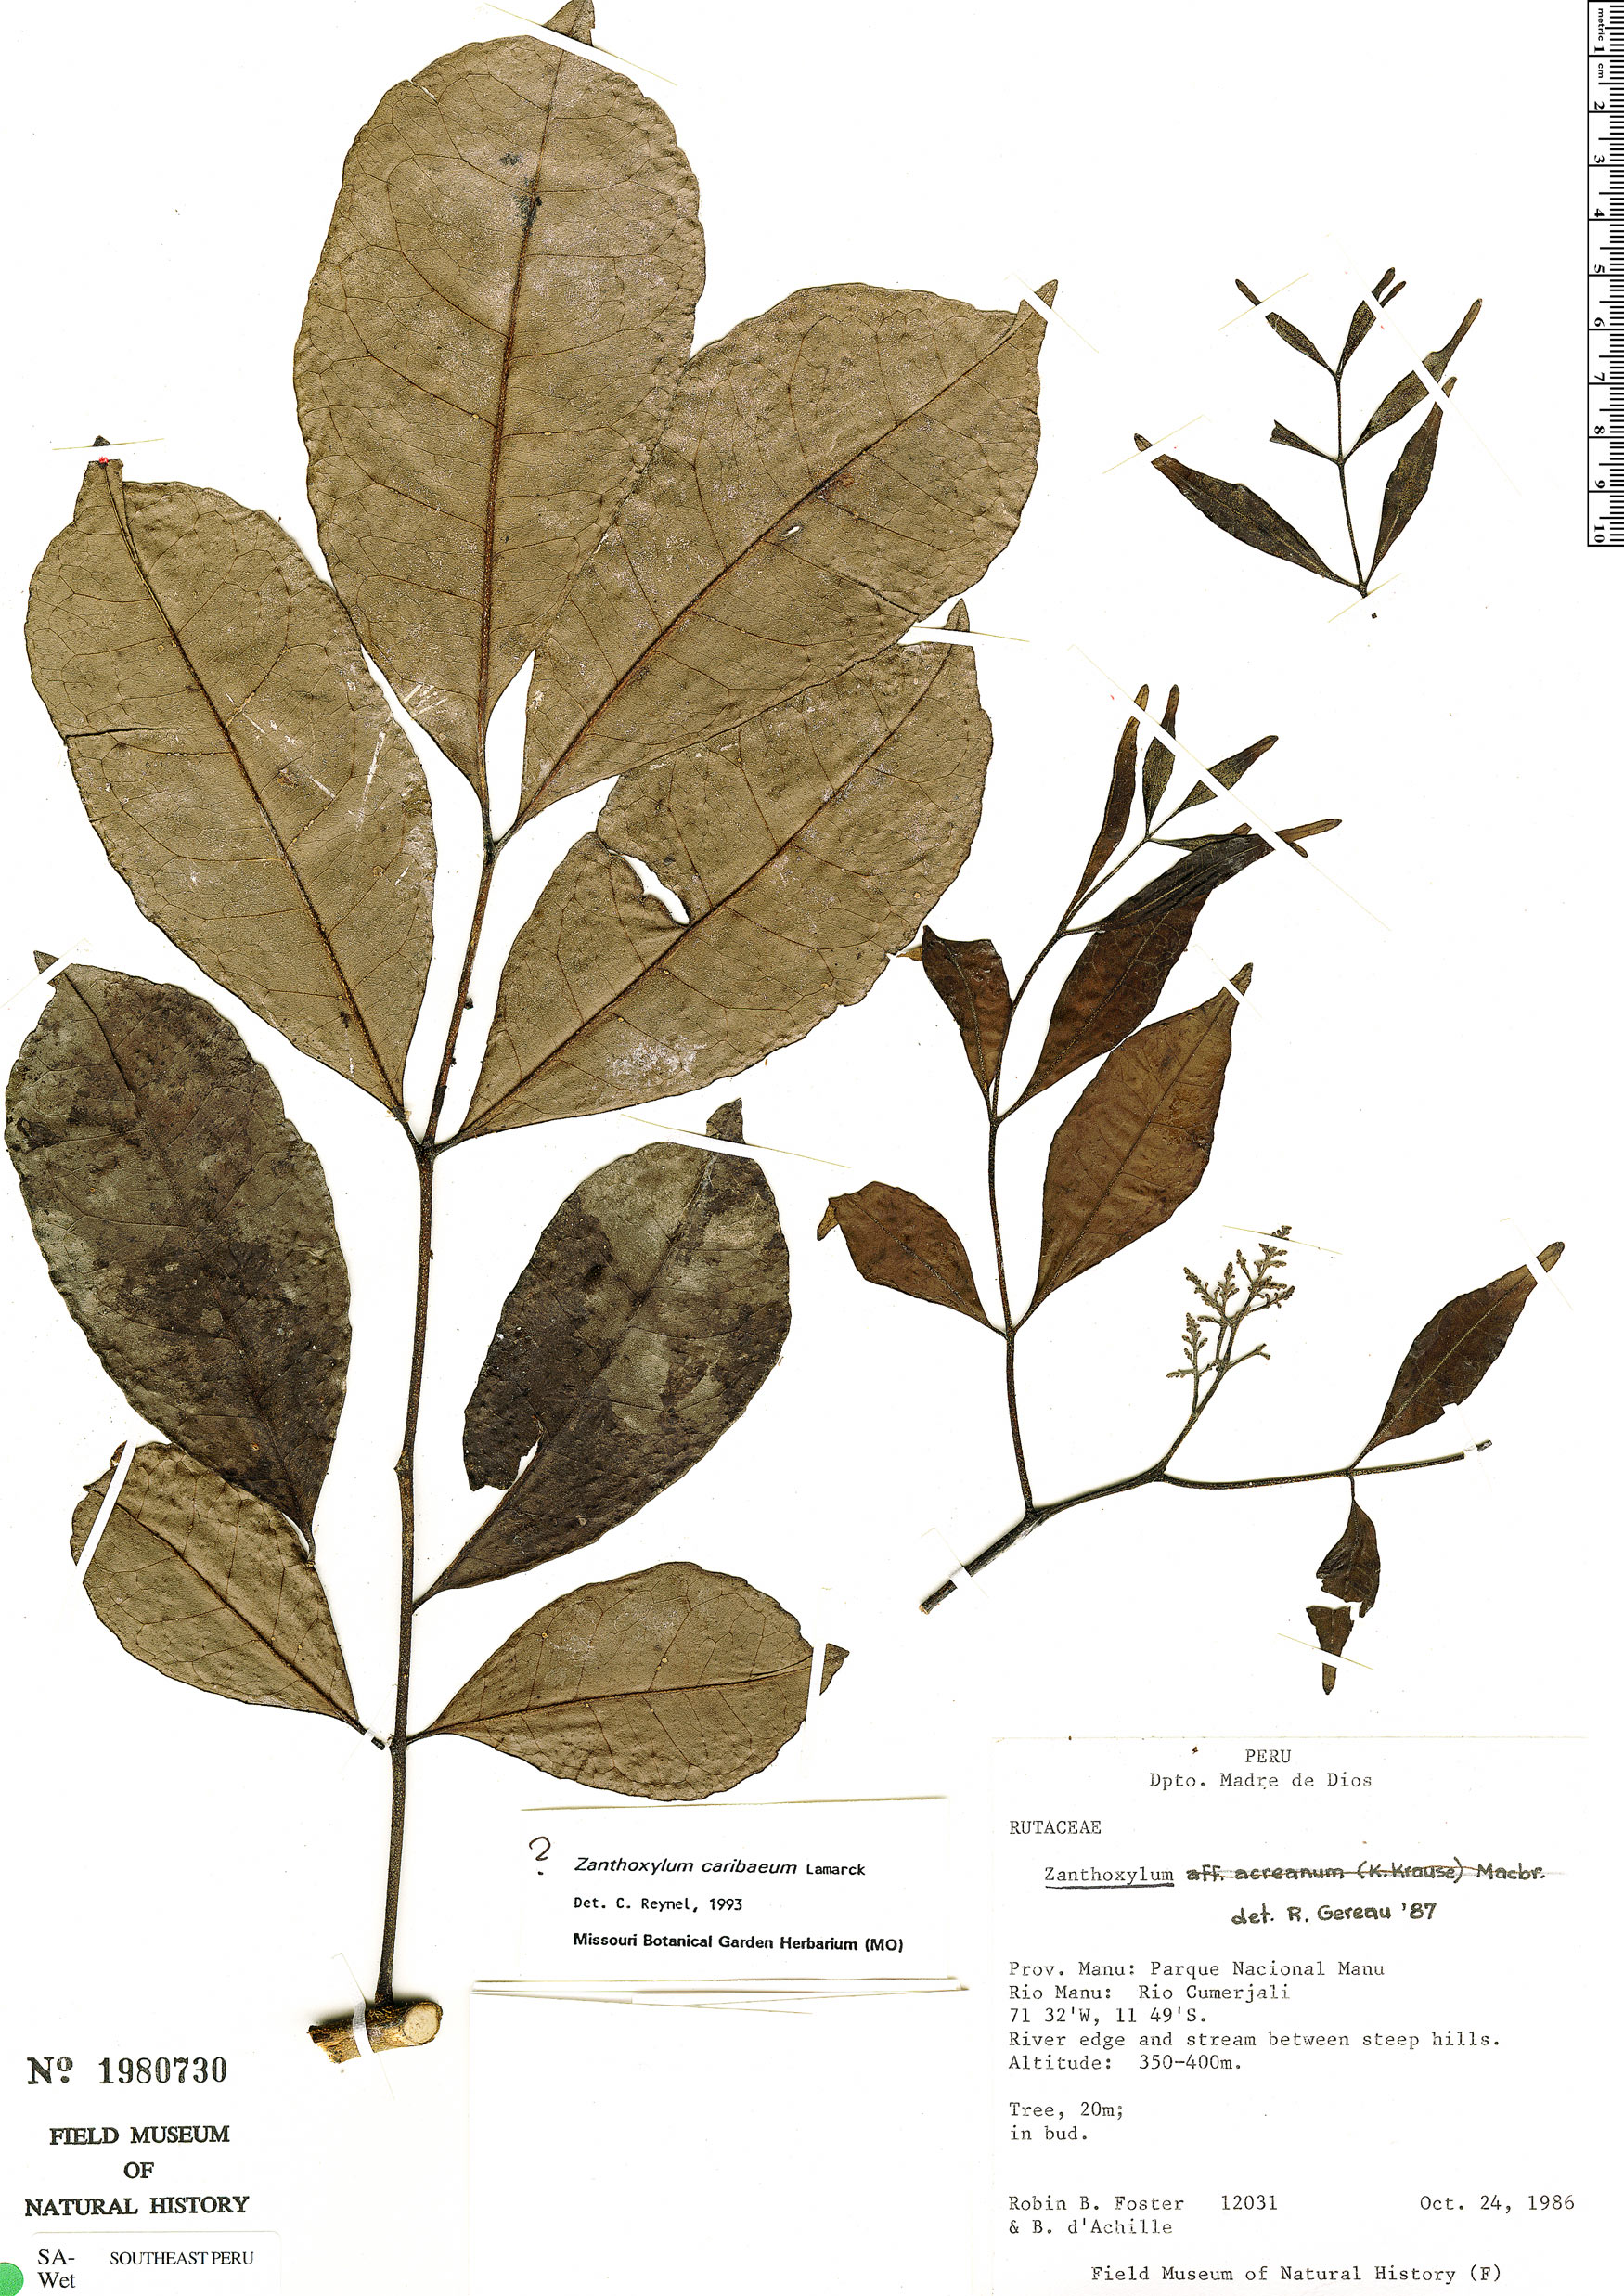 Specimen: Zanthoxylum caribaeum